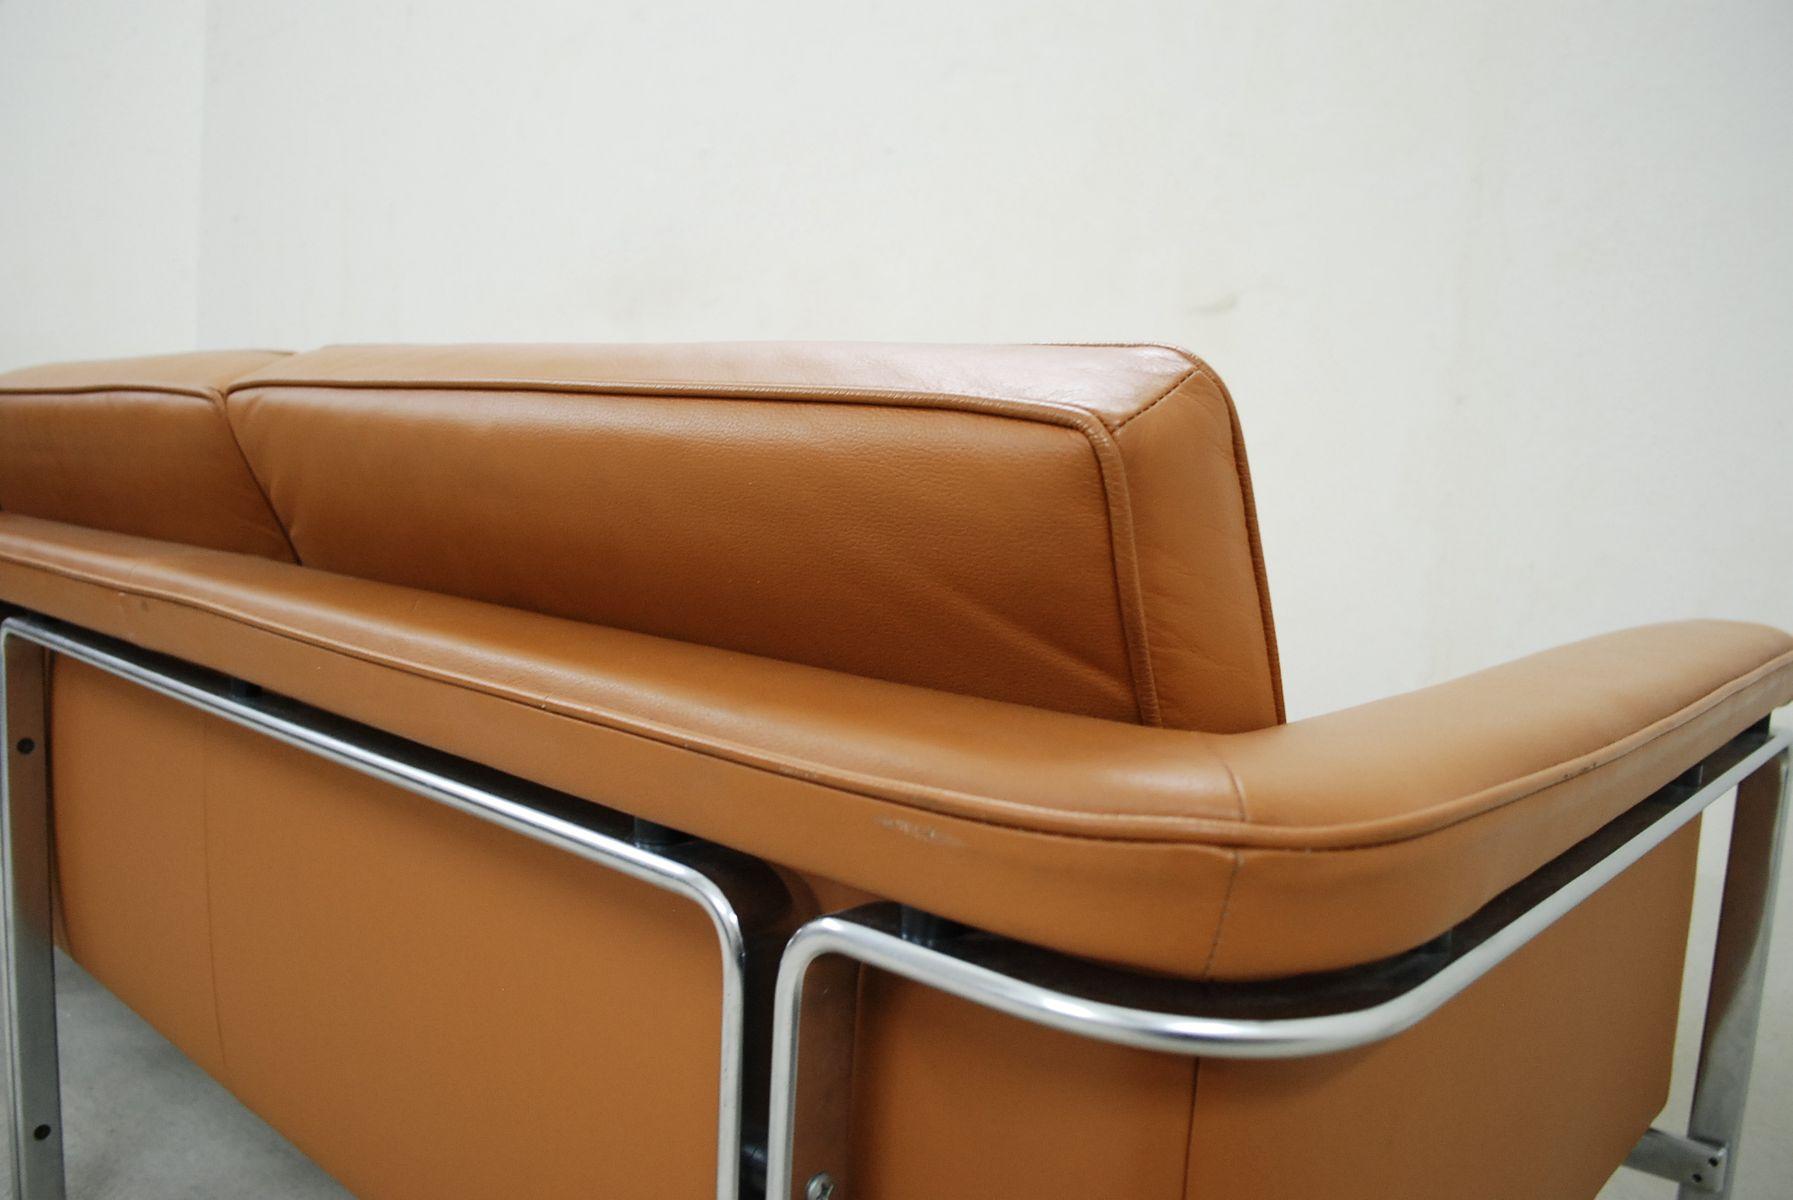 german 6913 cognac leather sofa by horst br ning for kill. Black Bedroom Furniture Sets. Home Design Ideas